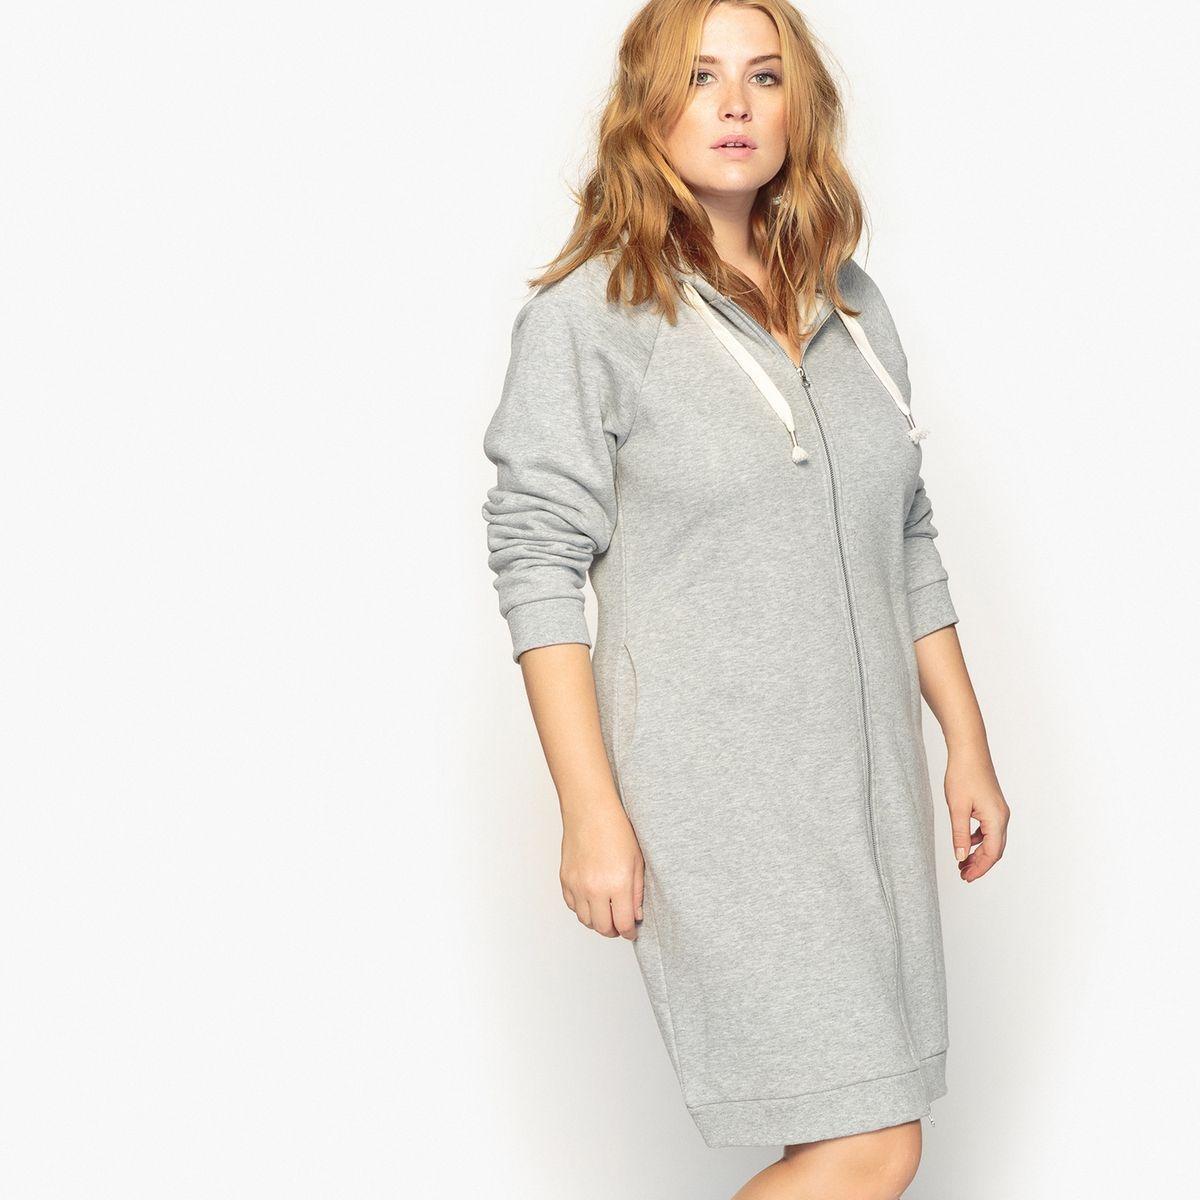 Robe sweat shirt entièrement zippée